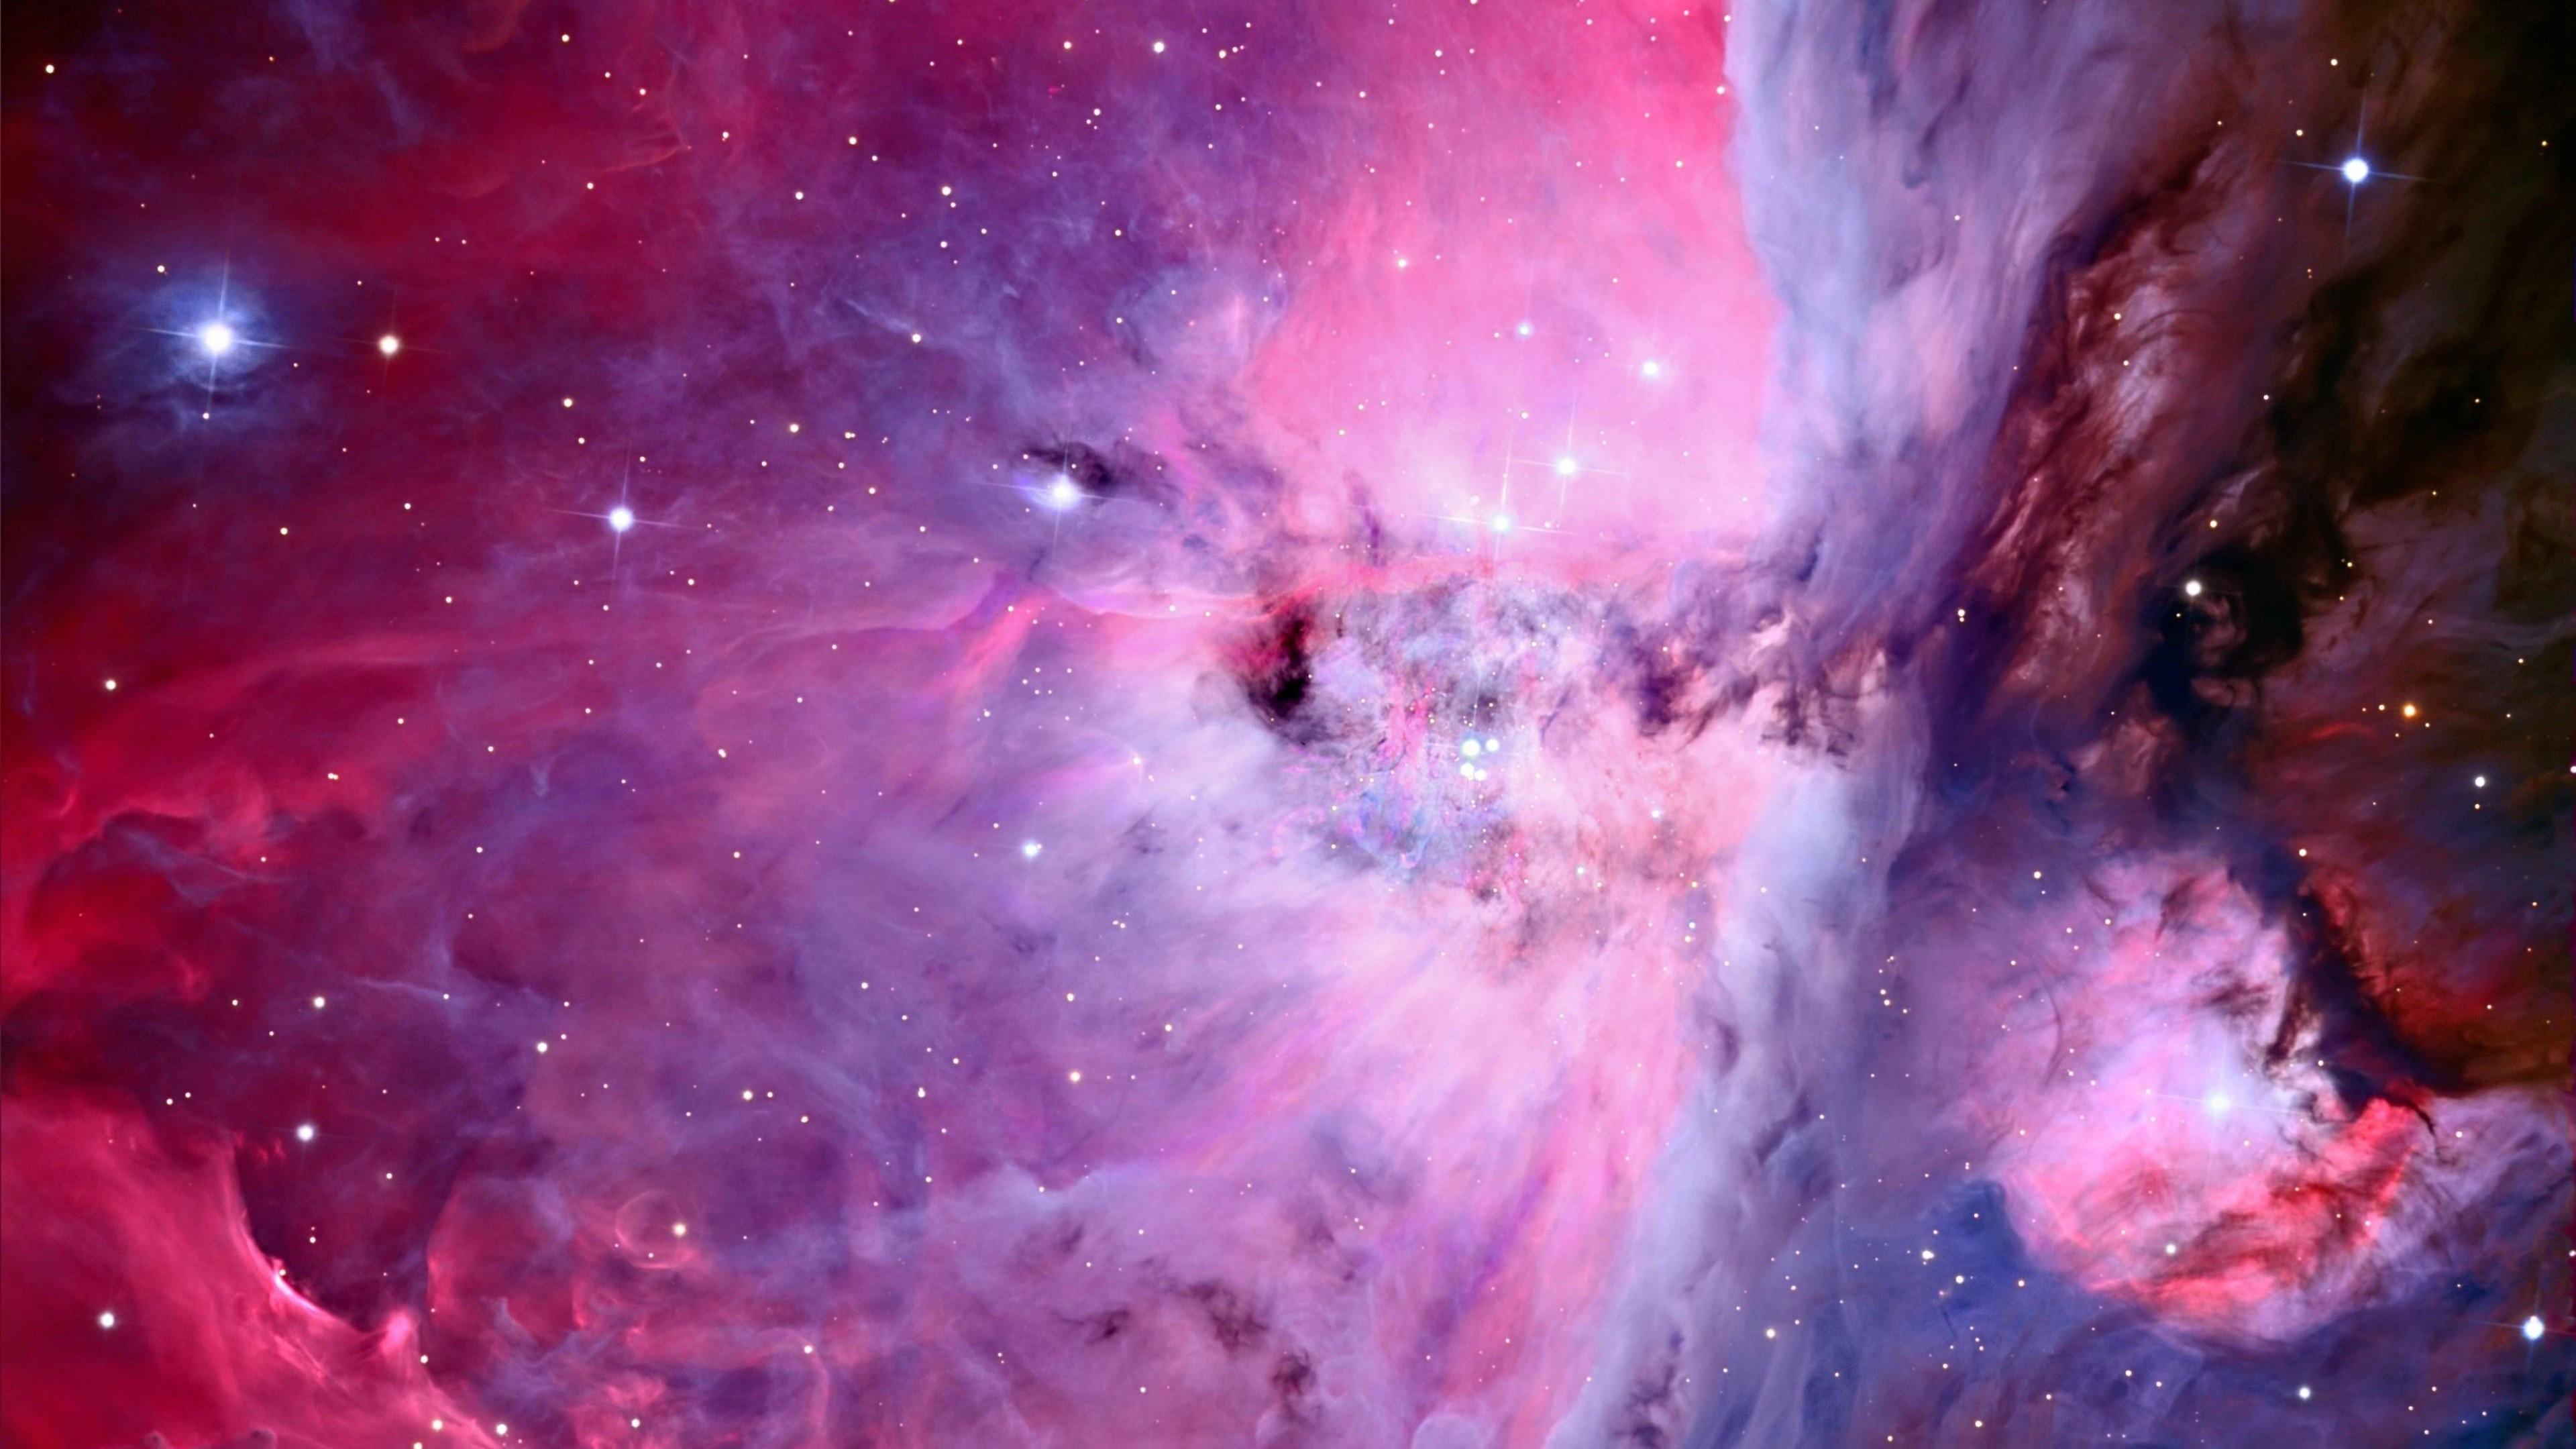 space stars nebula galaxy clouds 4k 1540140095 - Space Stars Nebula Galaxy Clouds 4k - stars wallpapers, space wallpapers, nebula wallpapers, hd-wallpapers, galaxy wallpapers, 4k-wallpapers